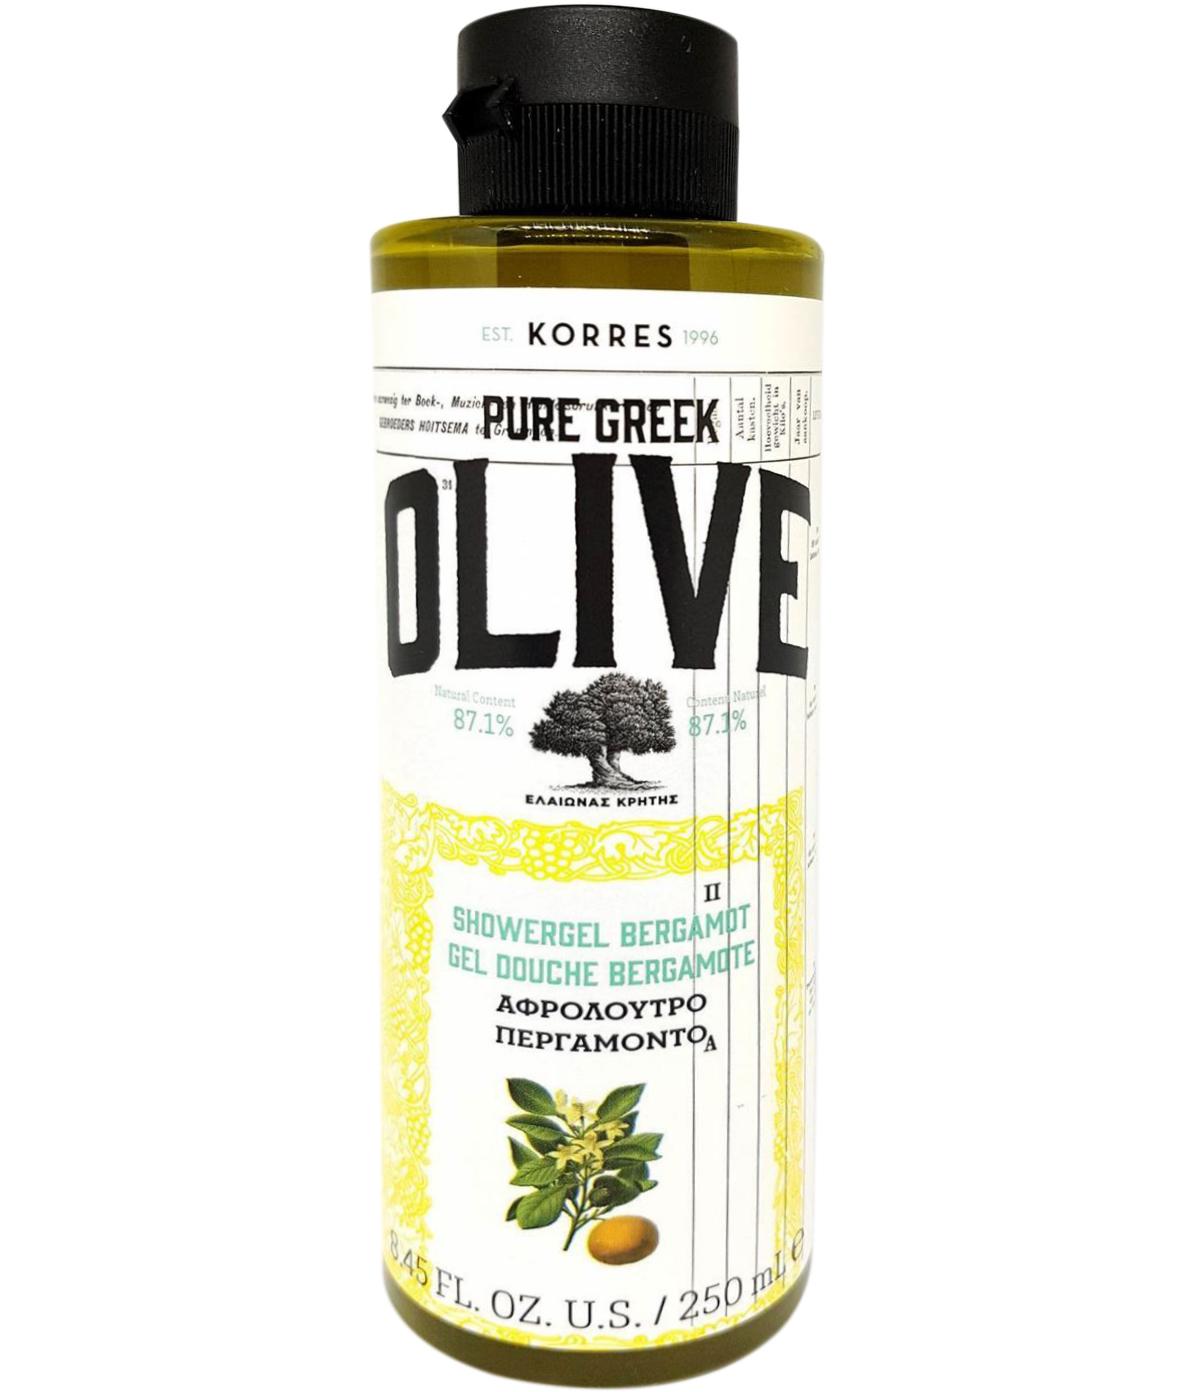 Korres Pure Greek Olive Shower Gel Bergamot Αφρόλουτρο με Τονωτικό Εκχύλισμα Φύλλων Ελιάς & Άρωμα Περγαμόντο 250ml